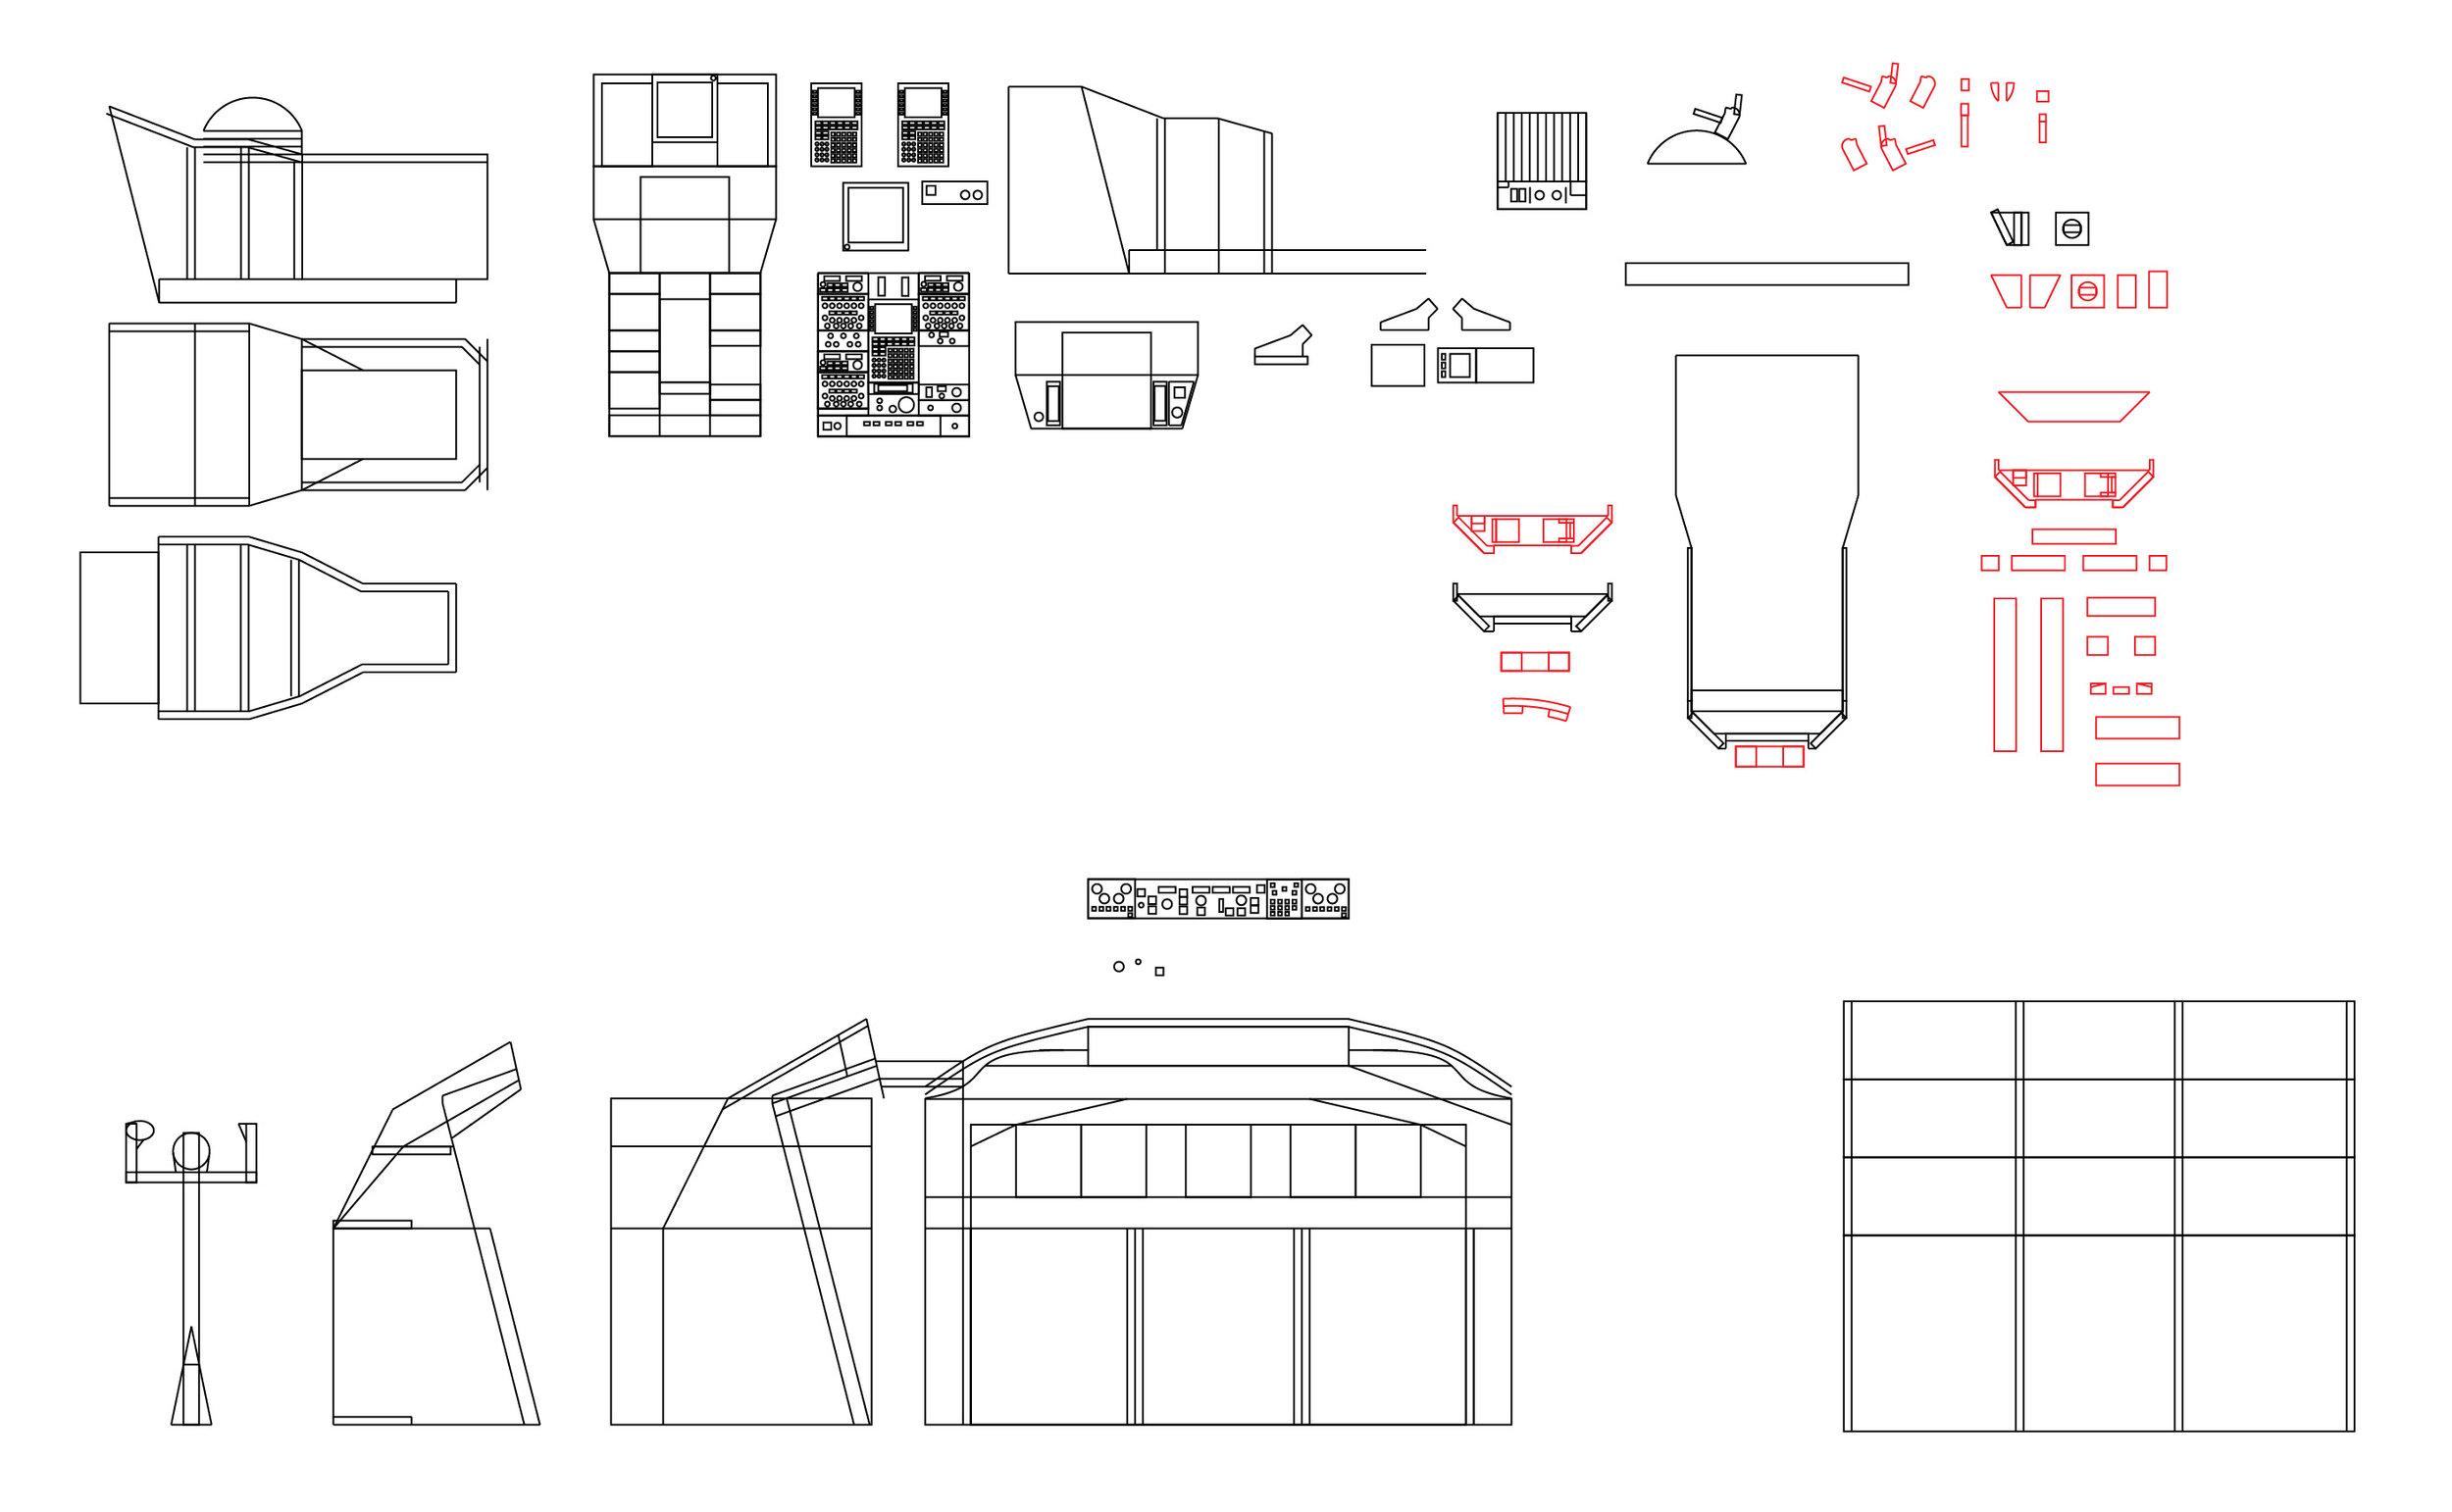 Cabin - cockpit - drawings 7.jpg